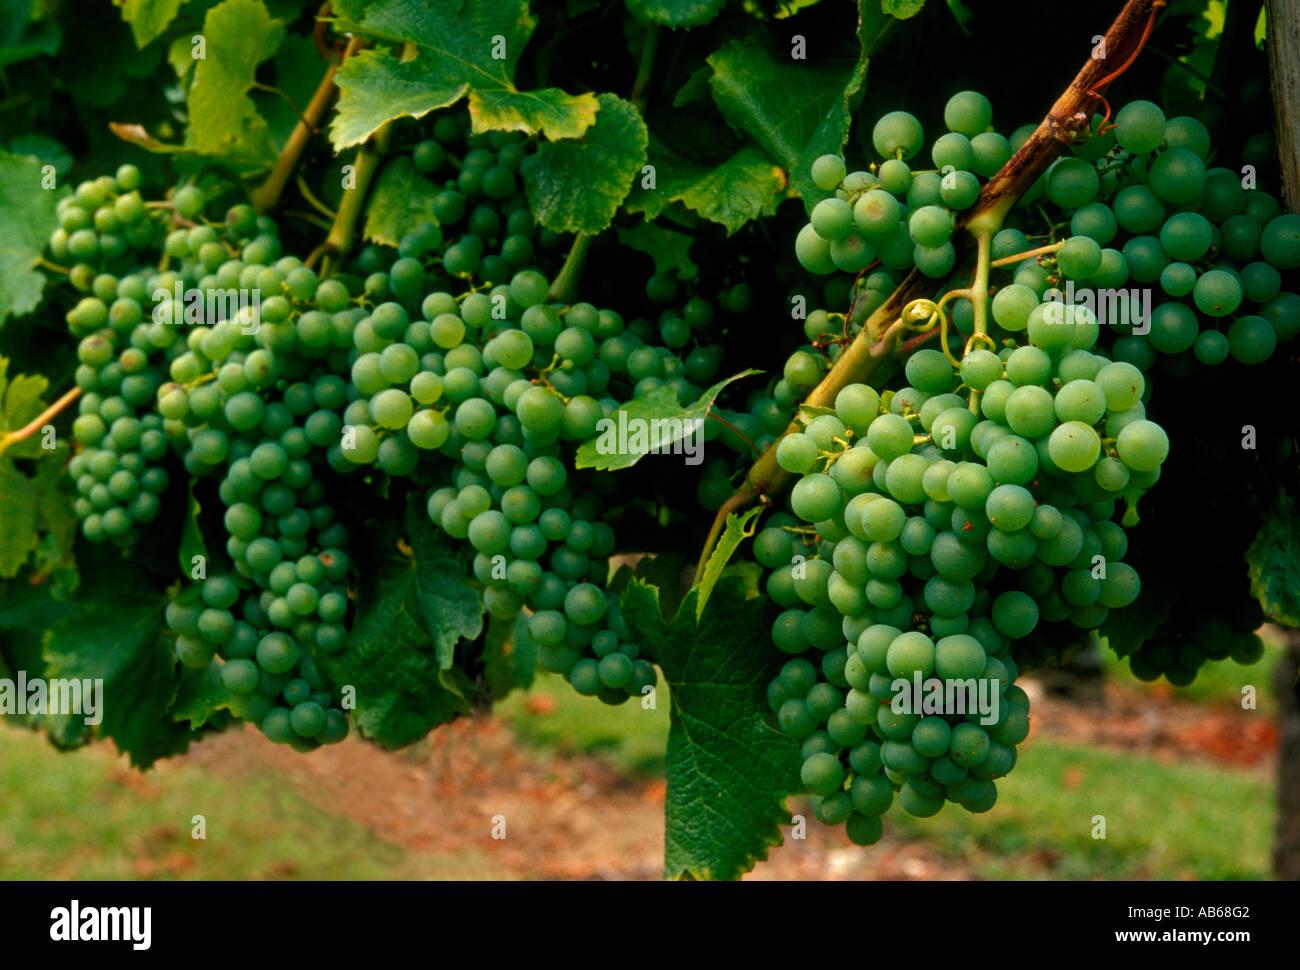 vineyard wine grapes on vine grapevine at chateau de monbazillac village of monbazillac dordogne france europe - Chateau De Monbazillac Mariage